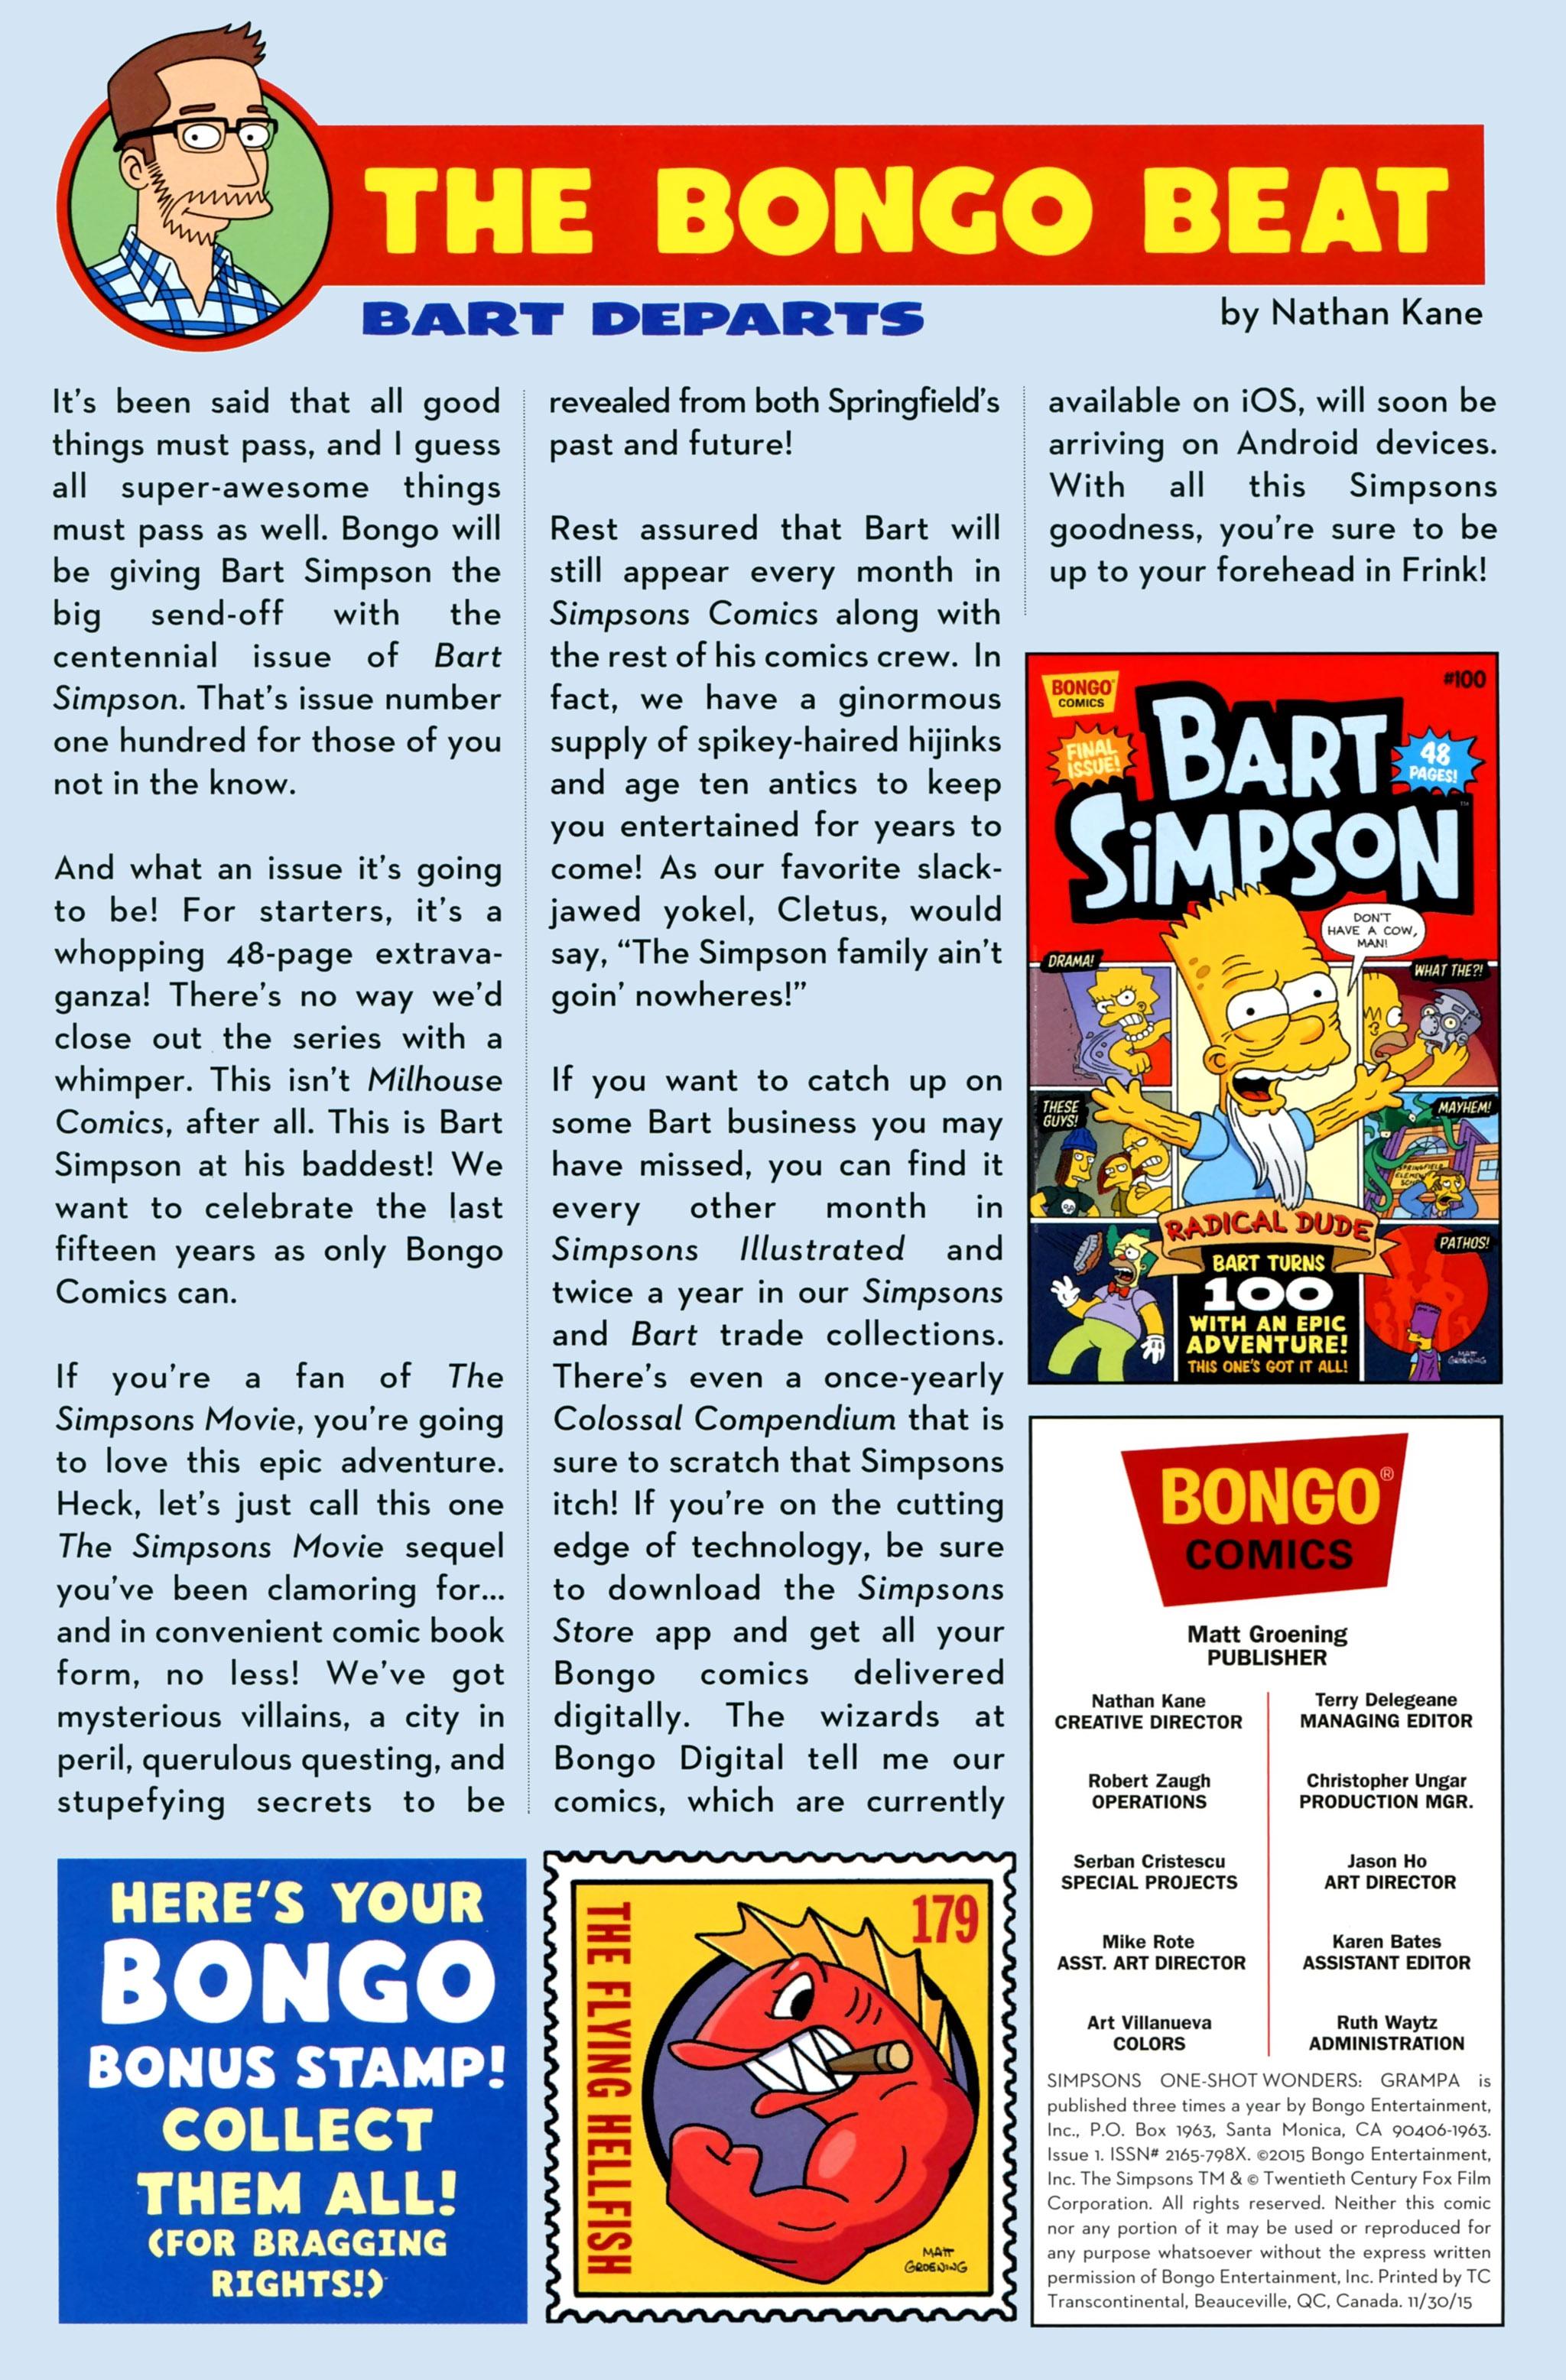 Read online Simpsons One-Shot Wonders: Grampa comic -  Issue # Full - 27